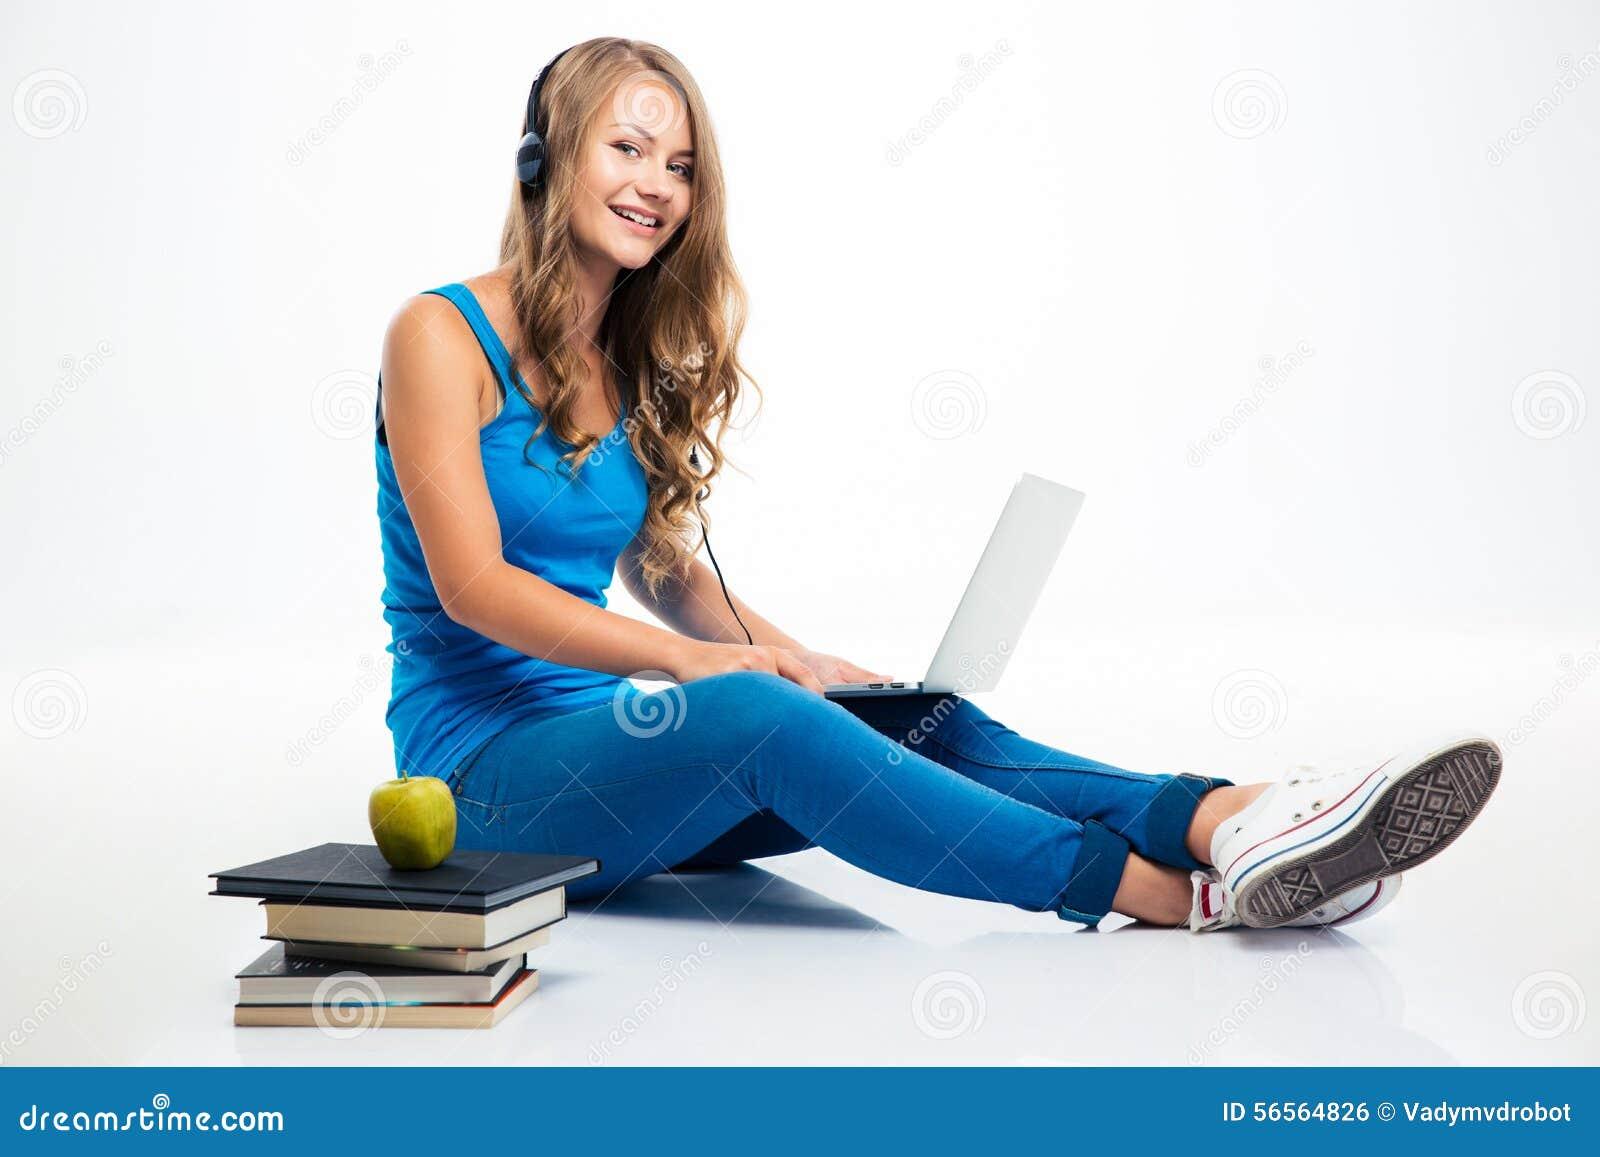 Download Μουσική ακούσματος κοριτσιών στα ακουστικά στο πάτωμα Στοκ Εικόνες - εικόνα από ευτυχία, ευτυχής: 56564826